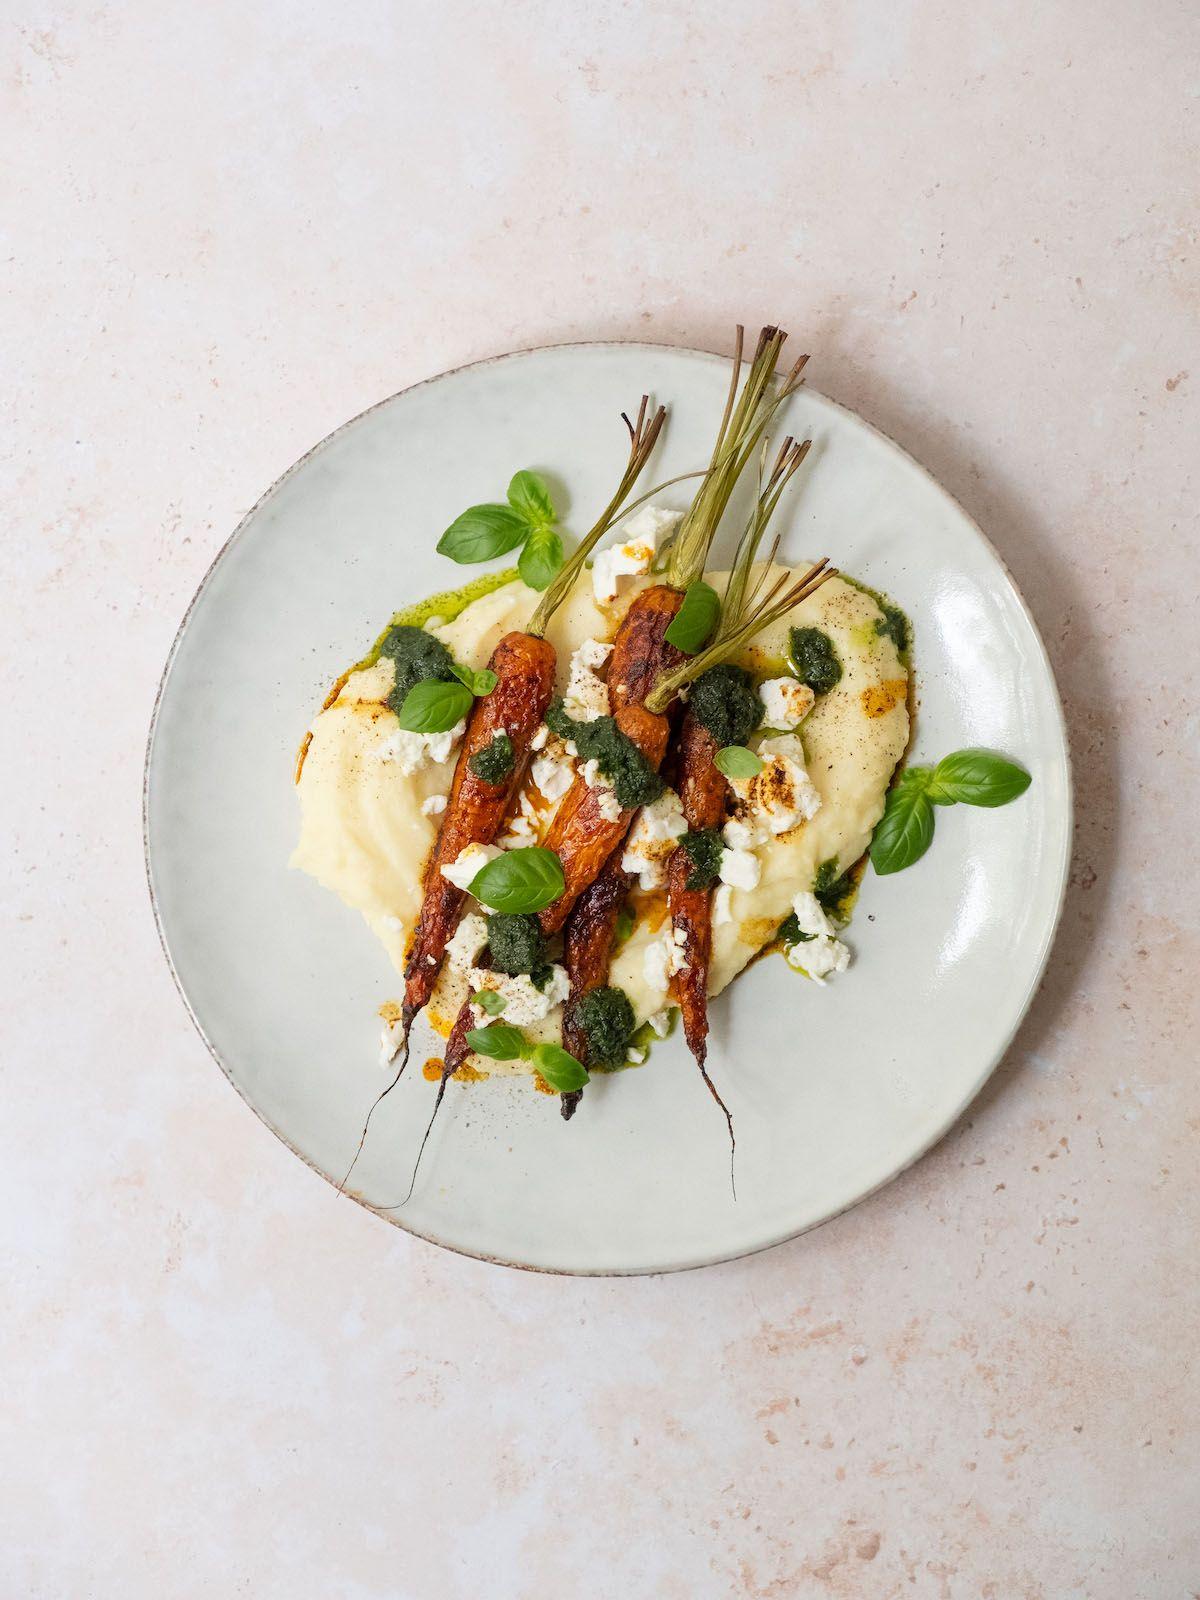 Foodblog, About Fuel, Rezept, Karotten, Pastinakenpüree